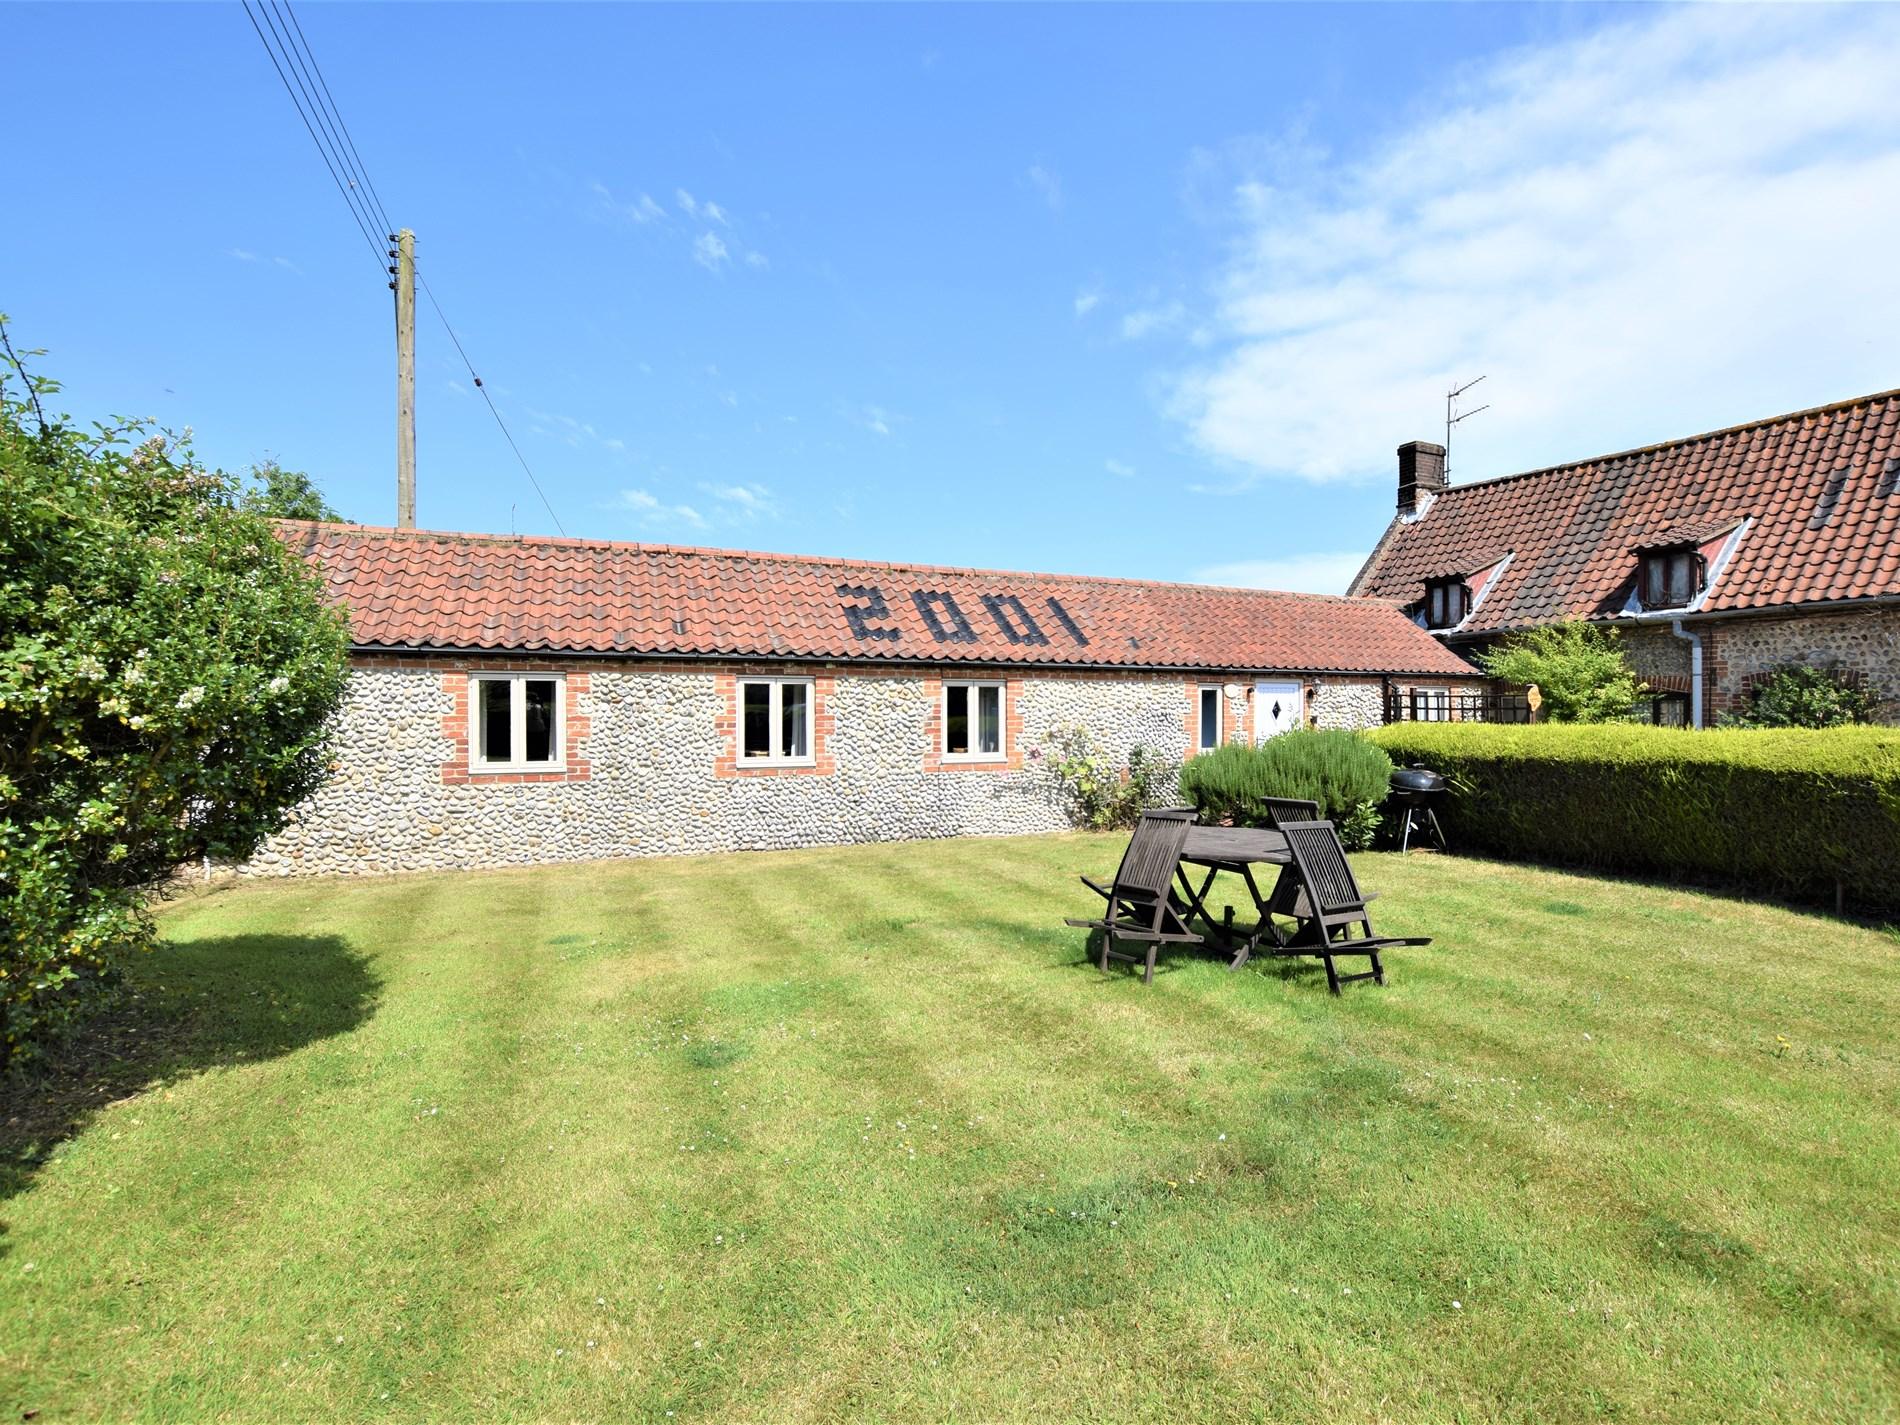 2 Bedroom Cottage in Holt, East Anglia